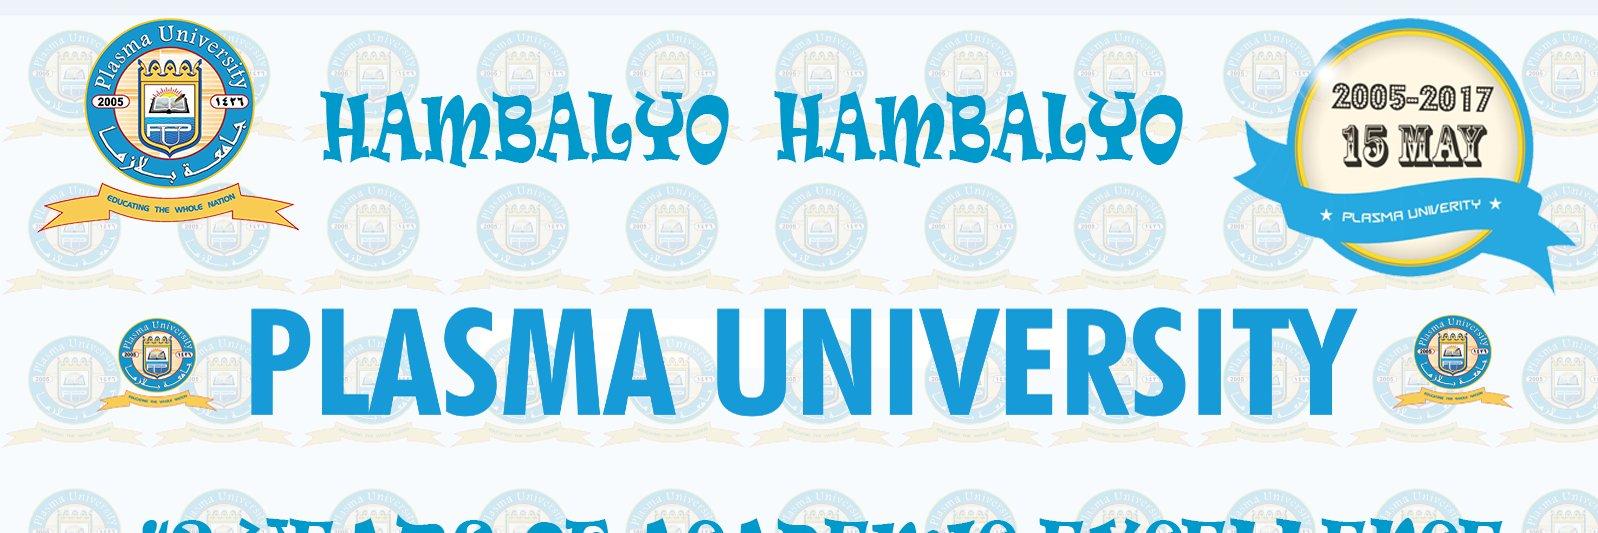 Jaamacada Plasma's official Twitter account